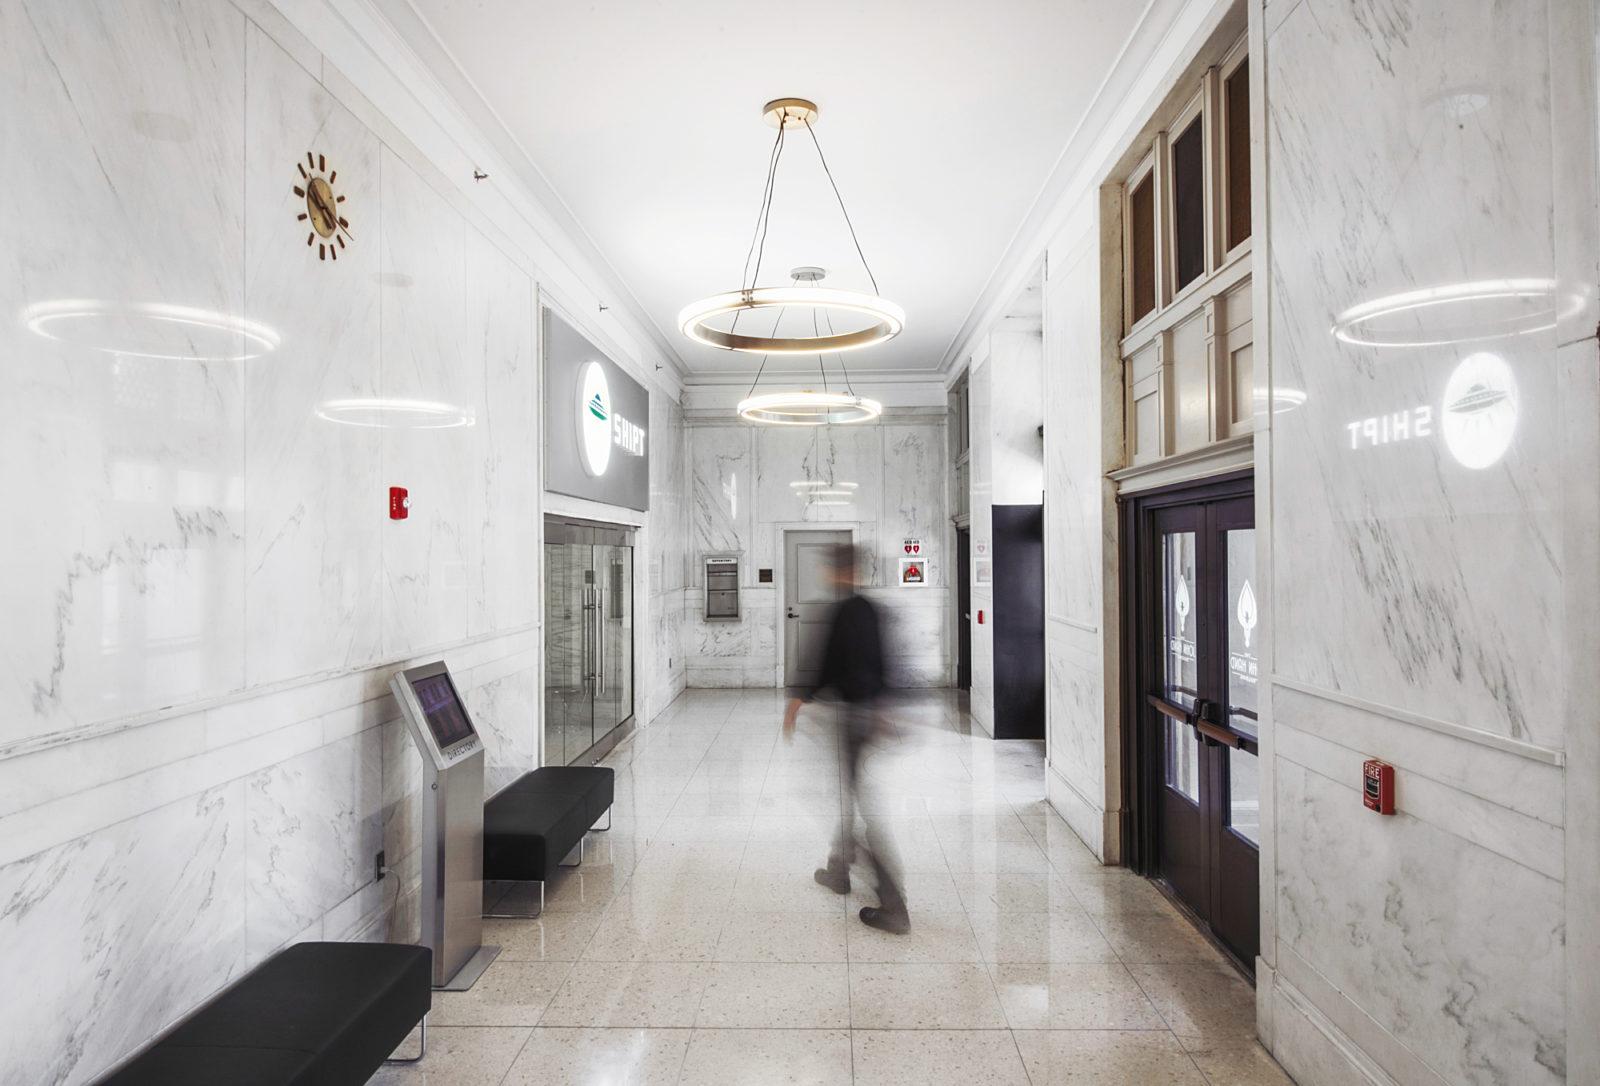 hallway in open office concept in Shipt headquarters Birmingham, AL